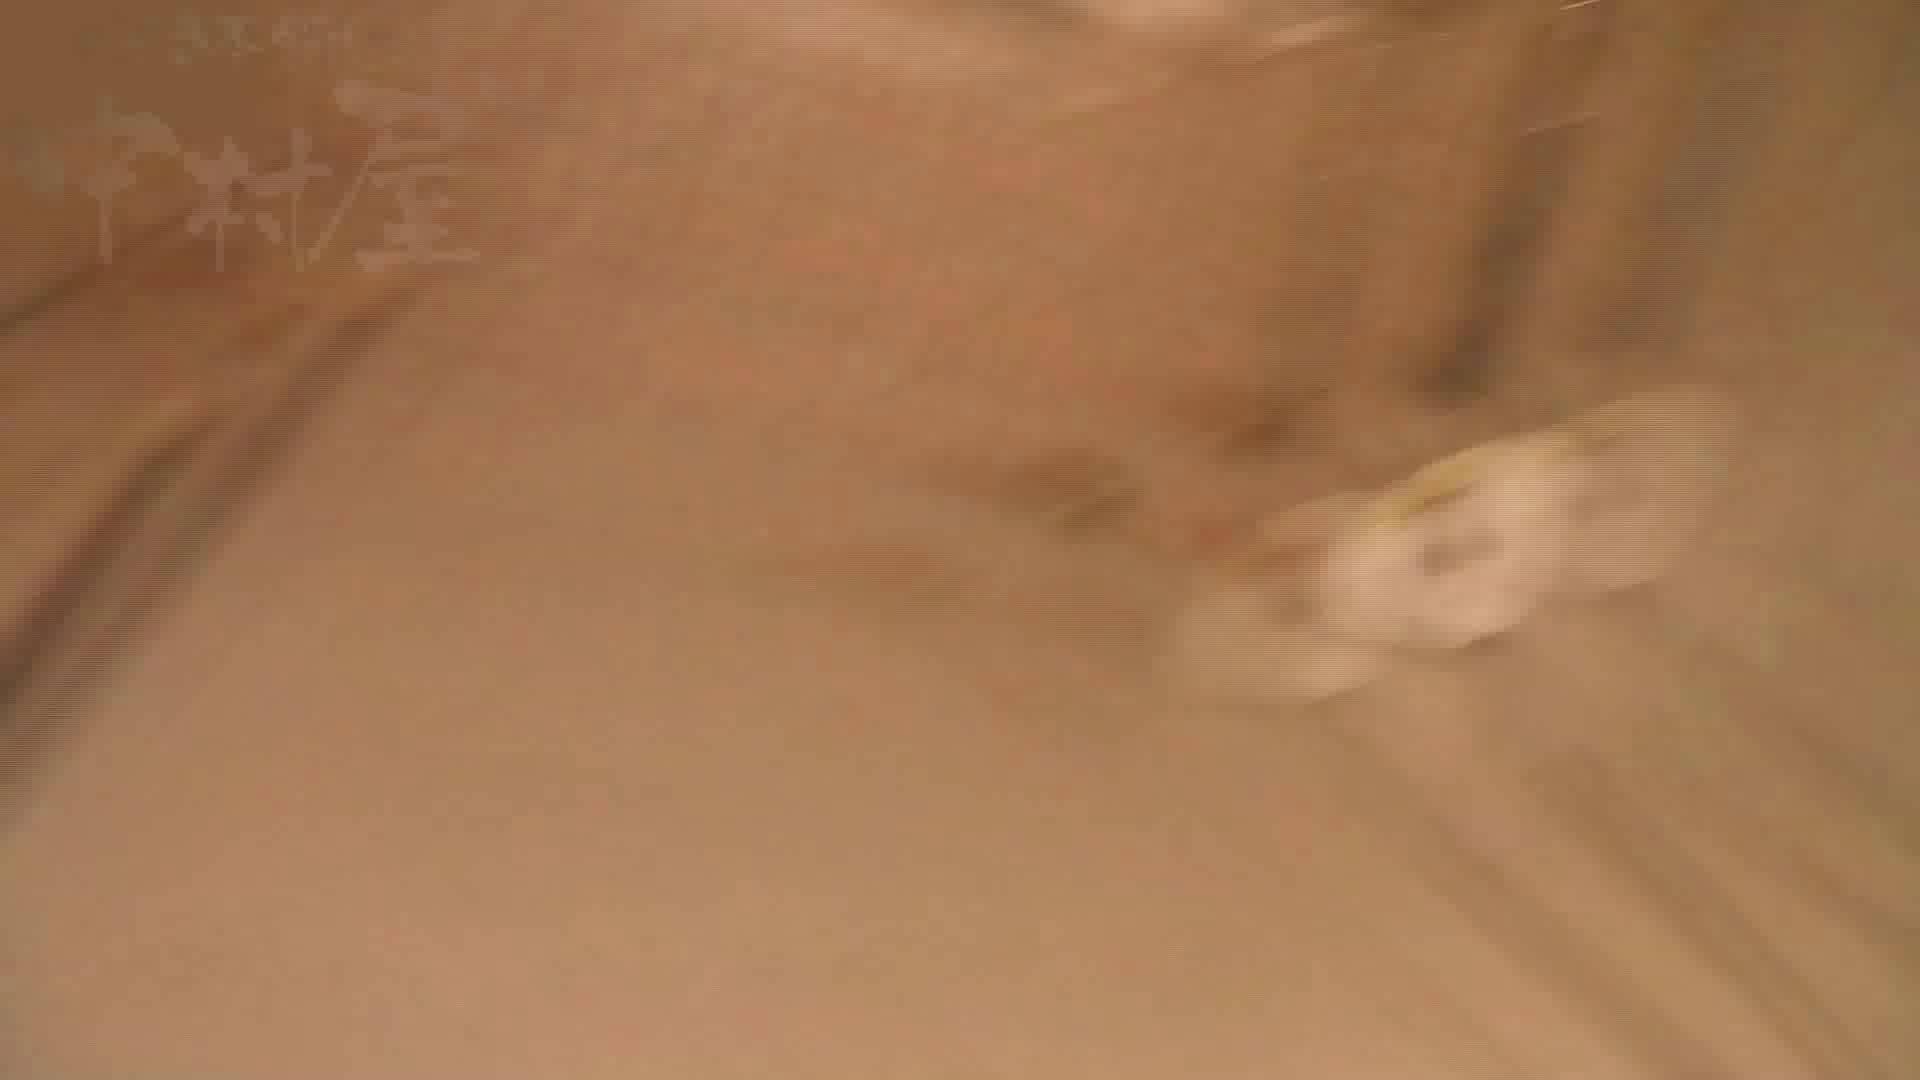 第三体育館潜入撮File024 最後の子公開残りは、SEIJUKU!! 盗撮大放出 濡れ場動画紹介 74連発 34